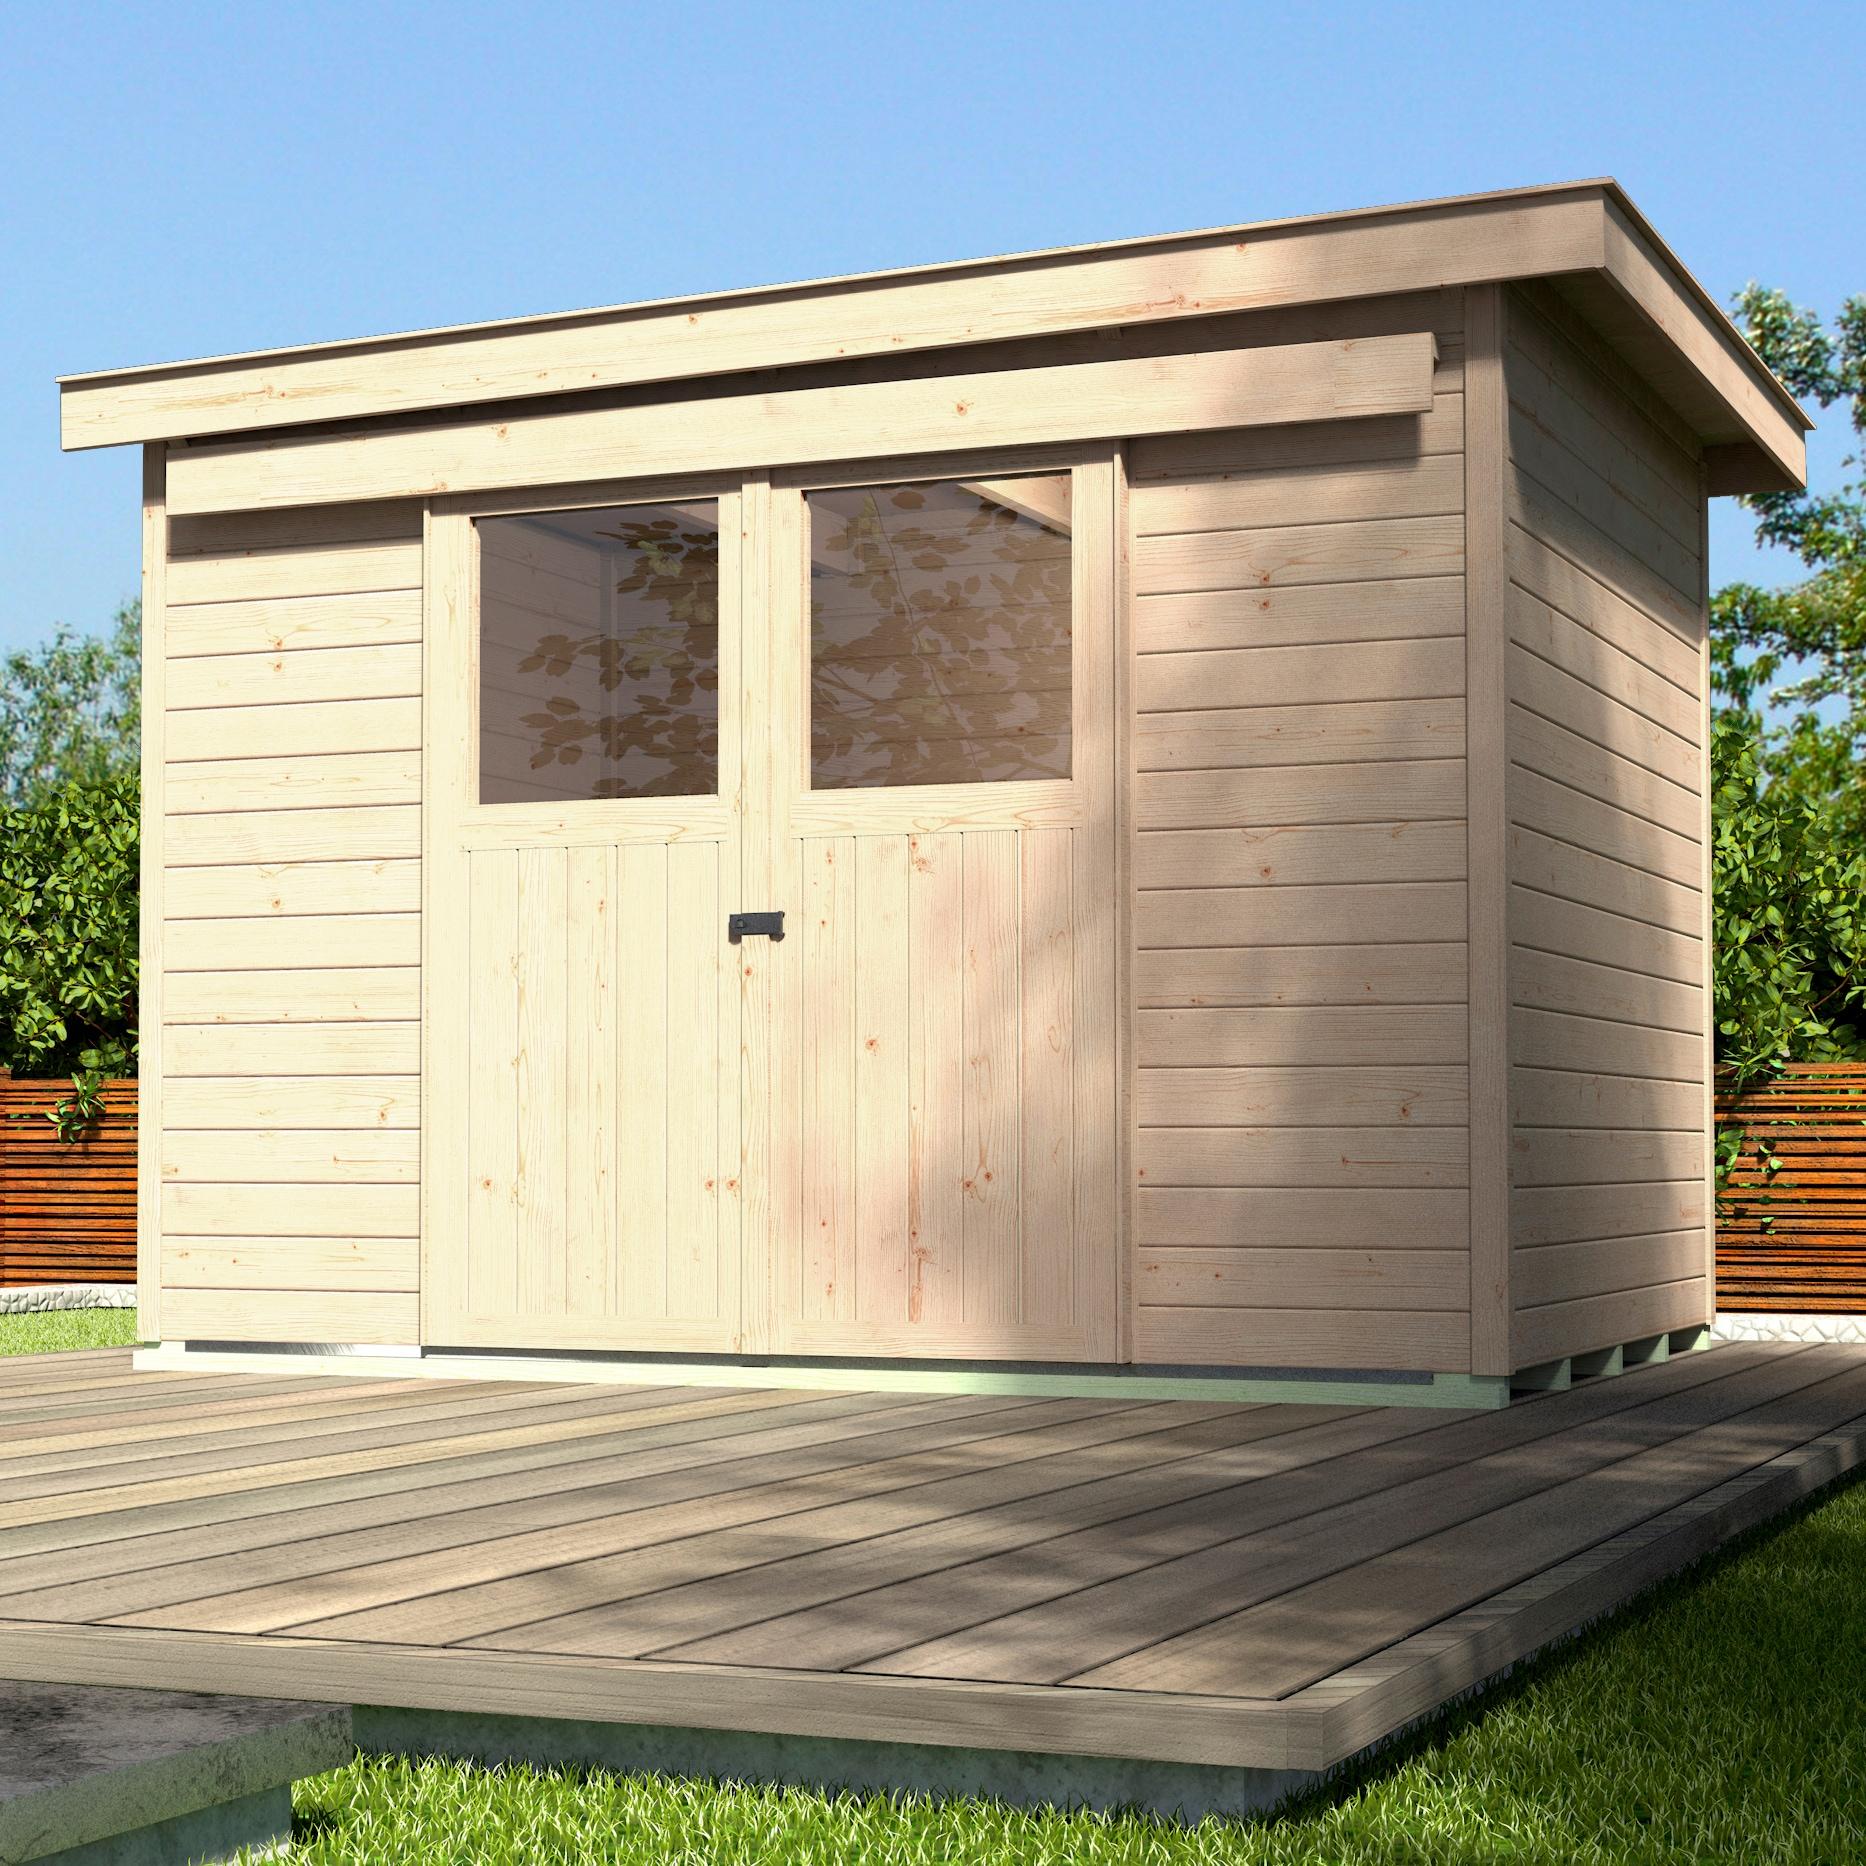 Gartenhaus Mit Fußboden Kaufen ~ Weka gartenhaus gr « bxt cm inkl fußboden online